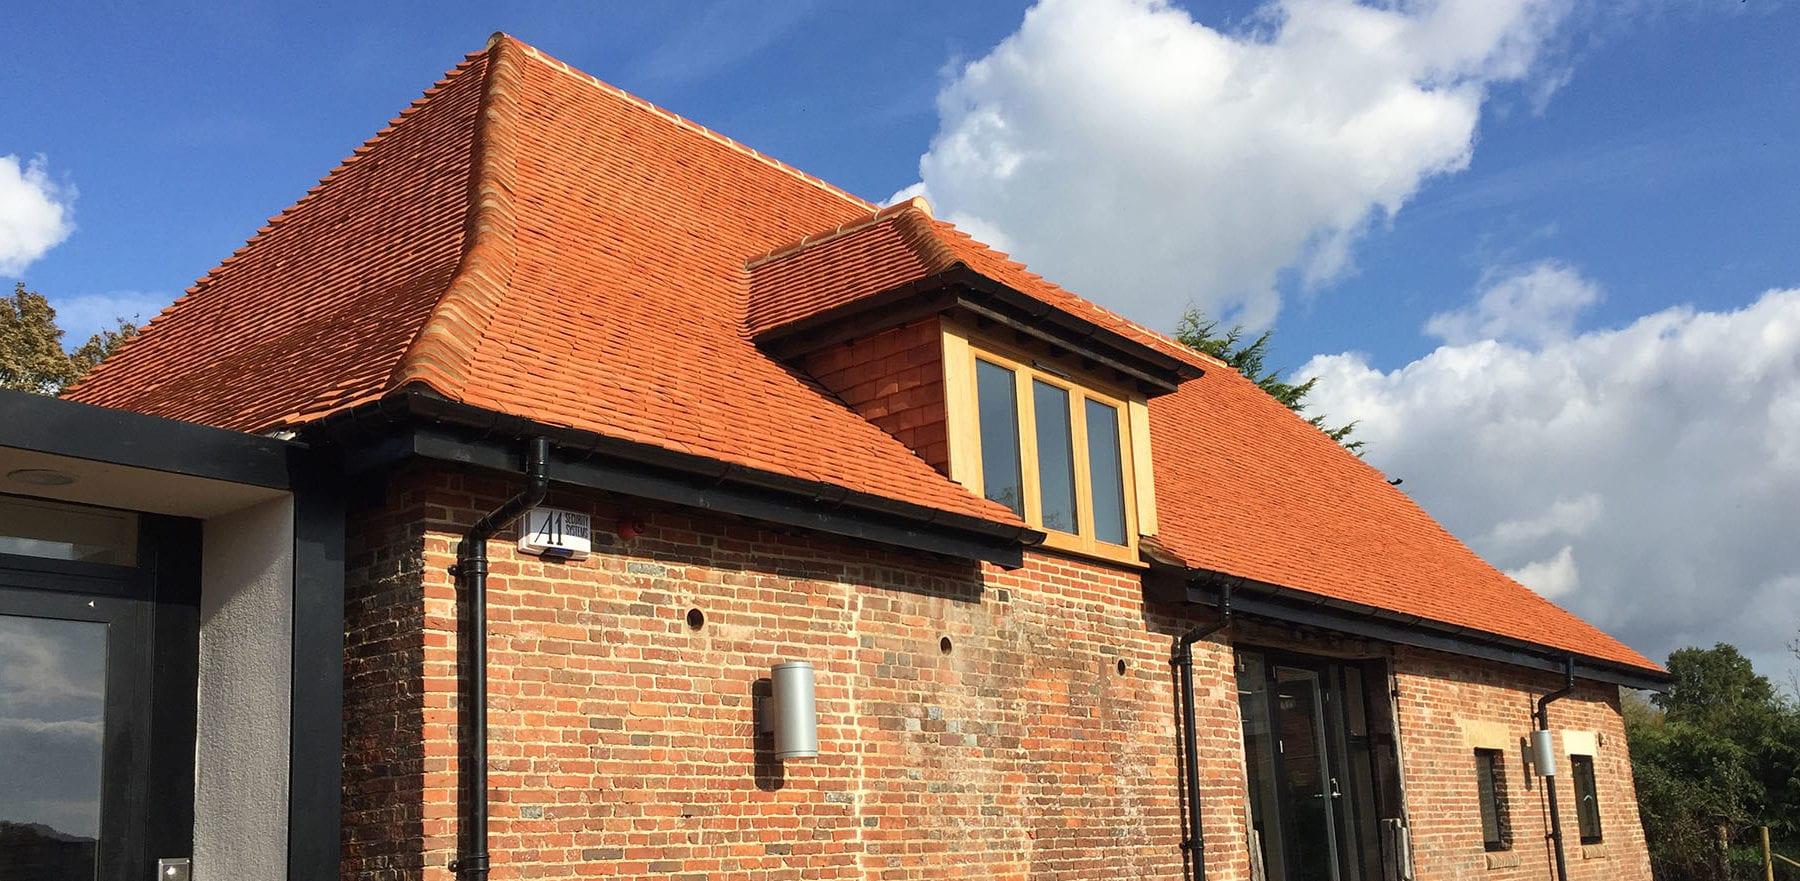 Lifestiles - Handcrafted Pentlow Clay Roof Tiles - Petersfield, England 5